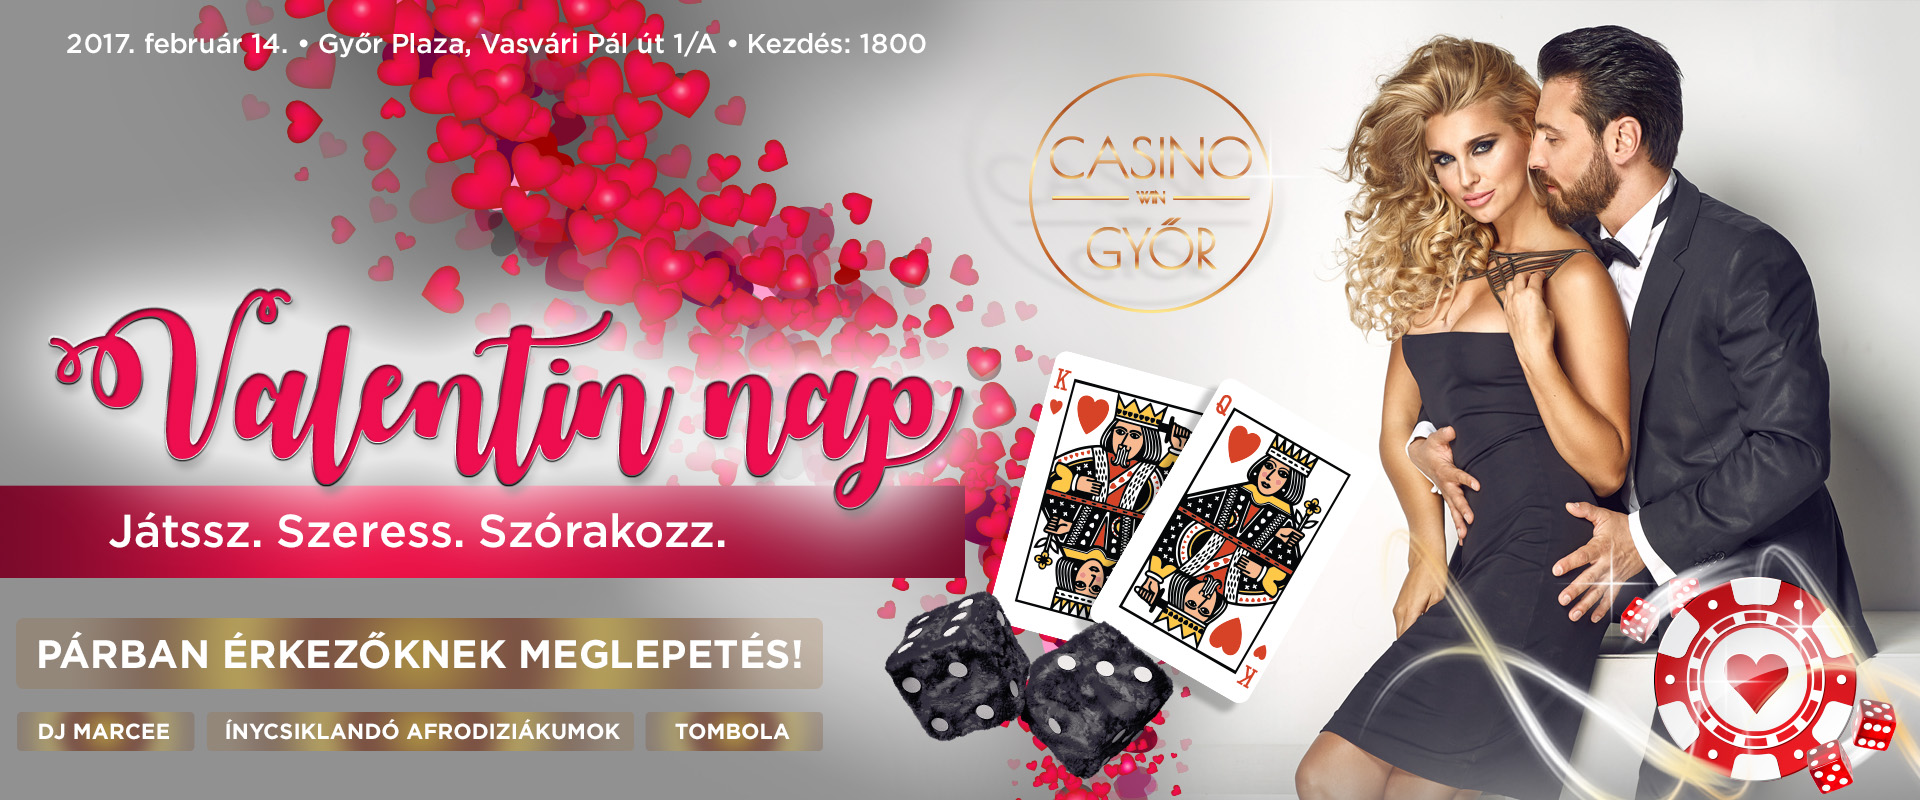 casinowin_1920x800_valentin